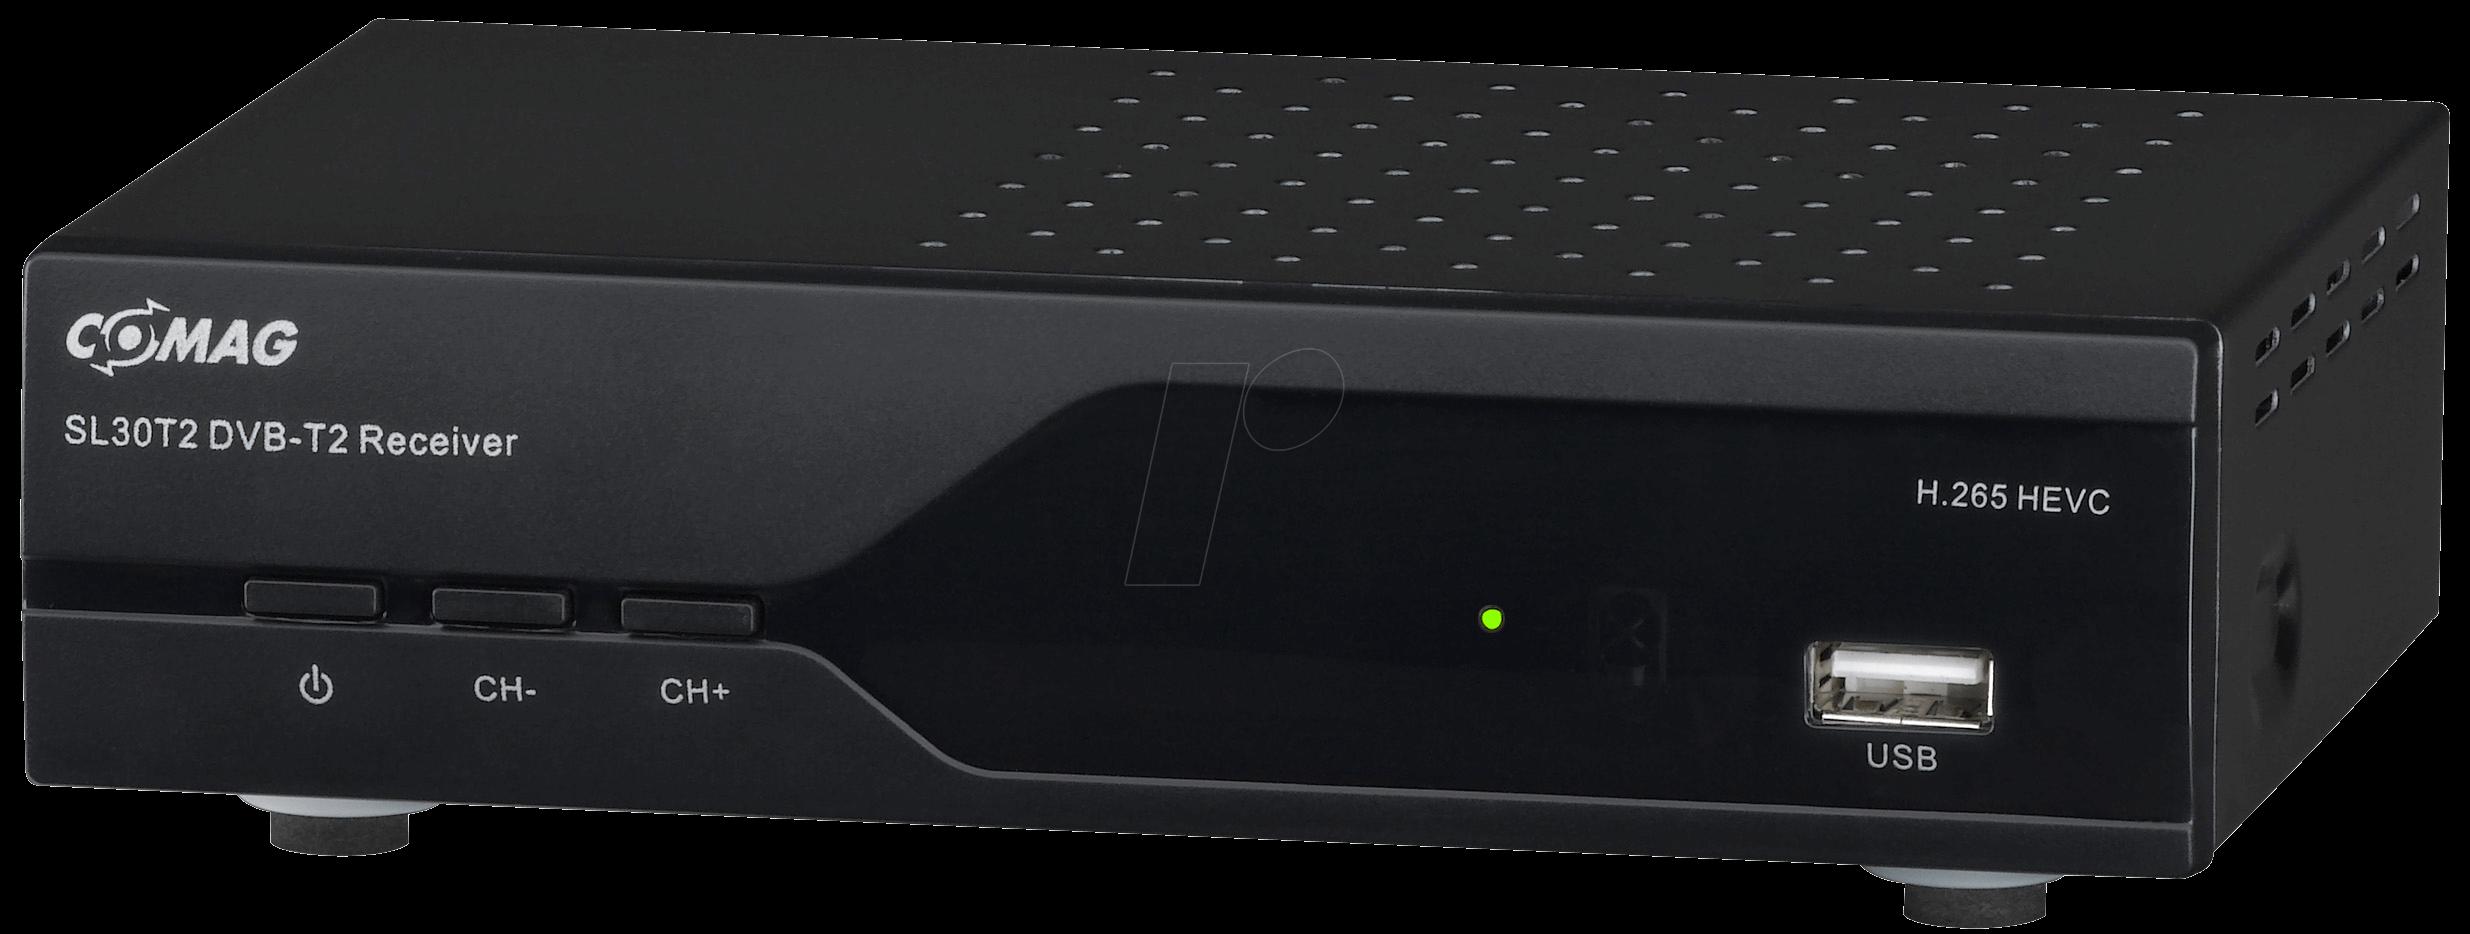 comag sl30t2 dvb t2 receiver free to air at reichelt elektronik. Black Bedroom Furniture Sets. Home Design Ideas